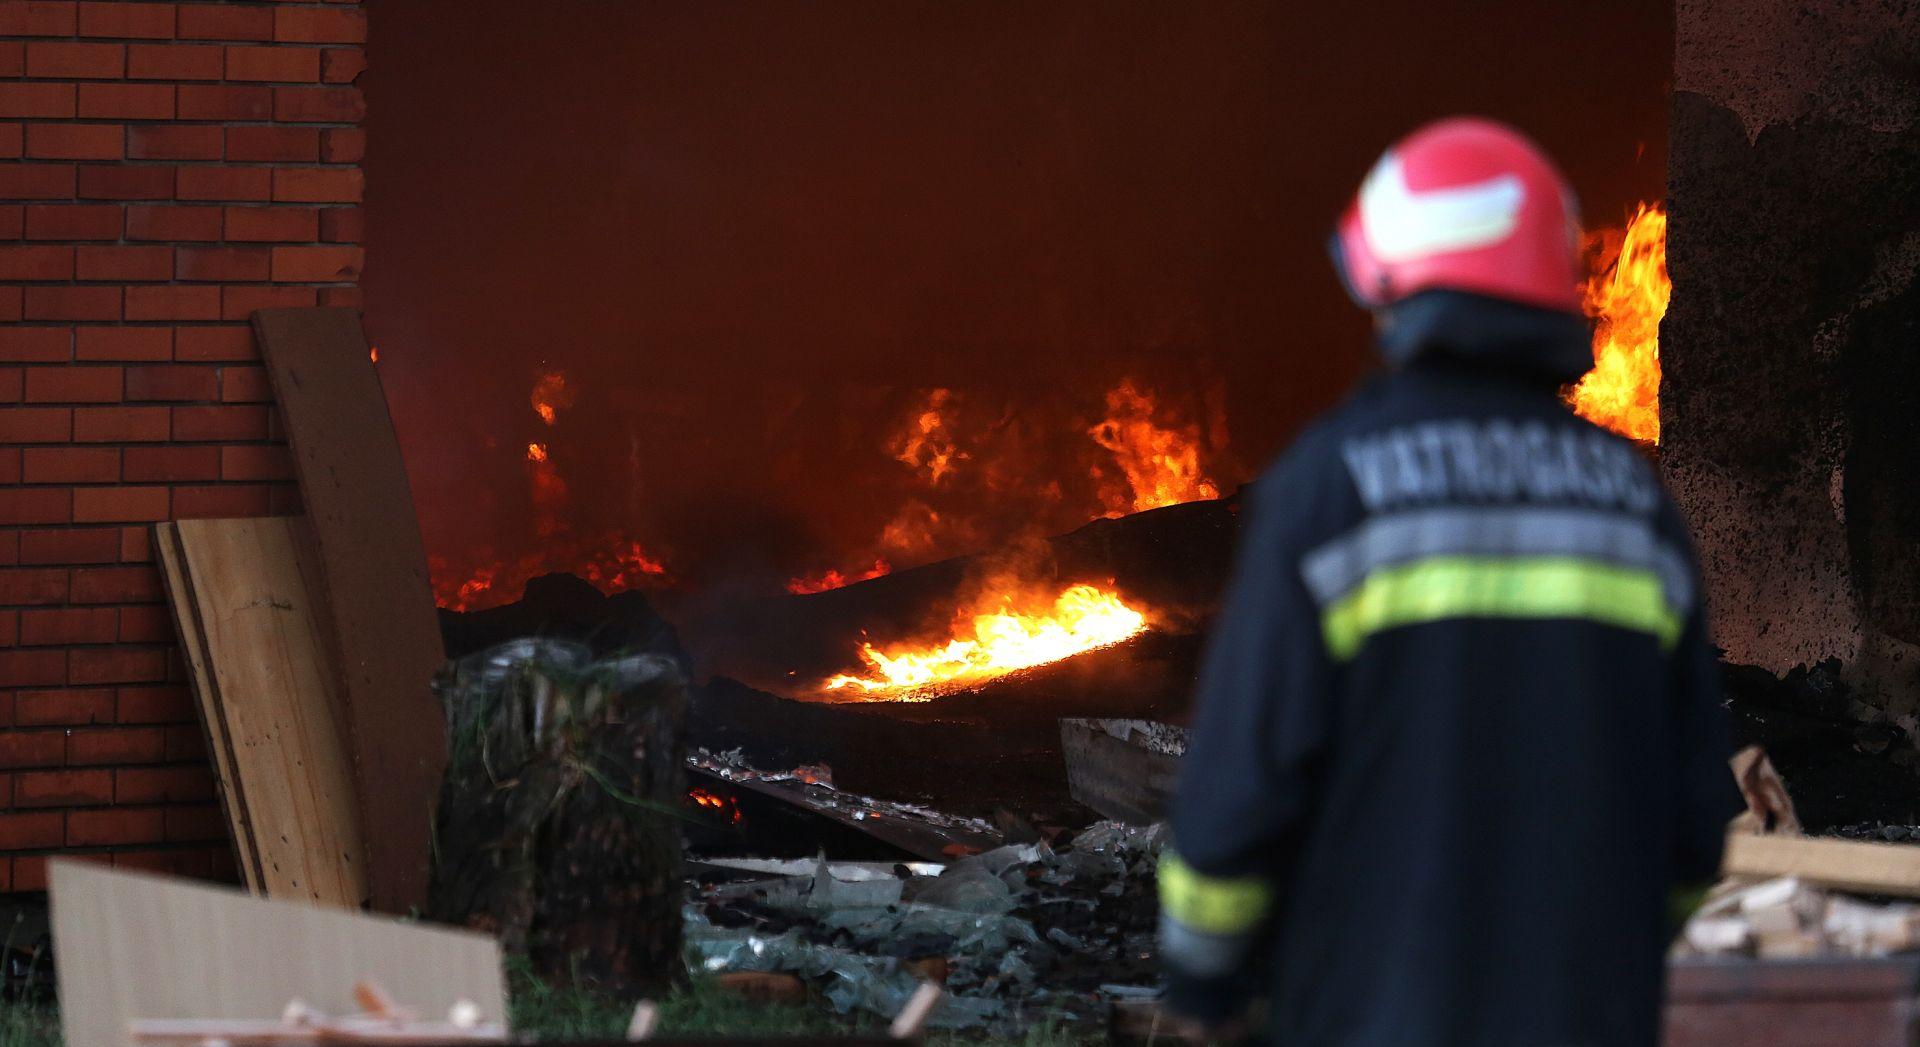 POŽAR U VINKOVCIMA: Izgorjela lakirnica u krugu Drvne industrije Spačva